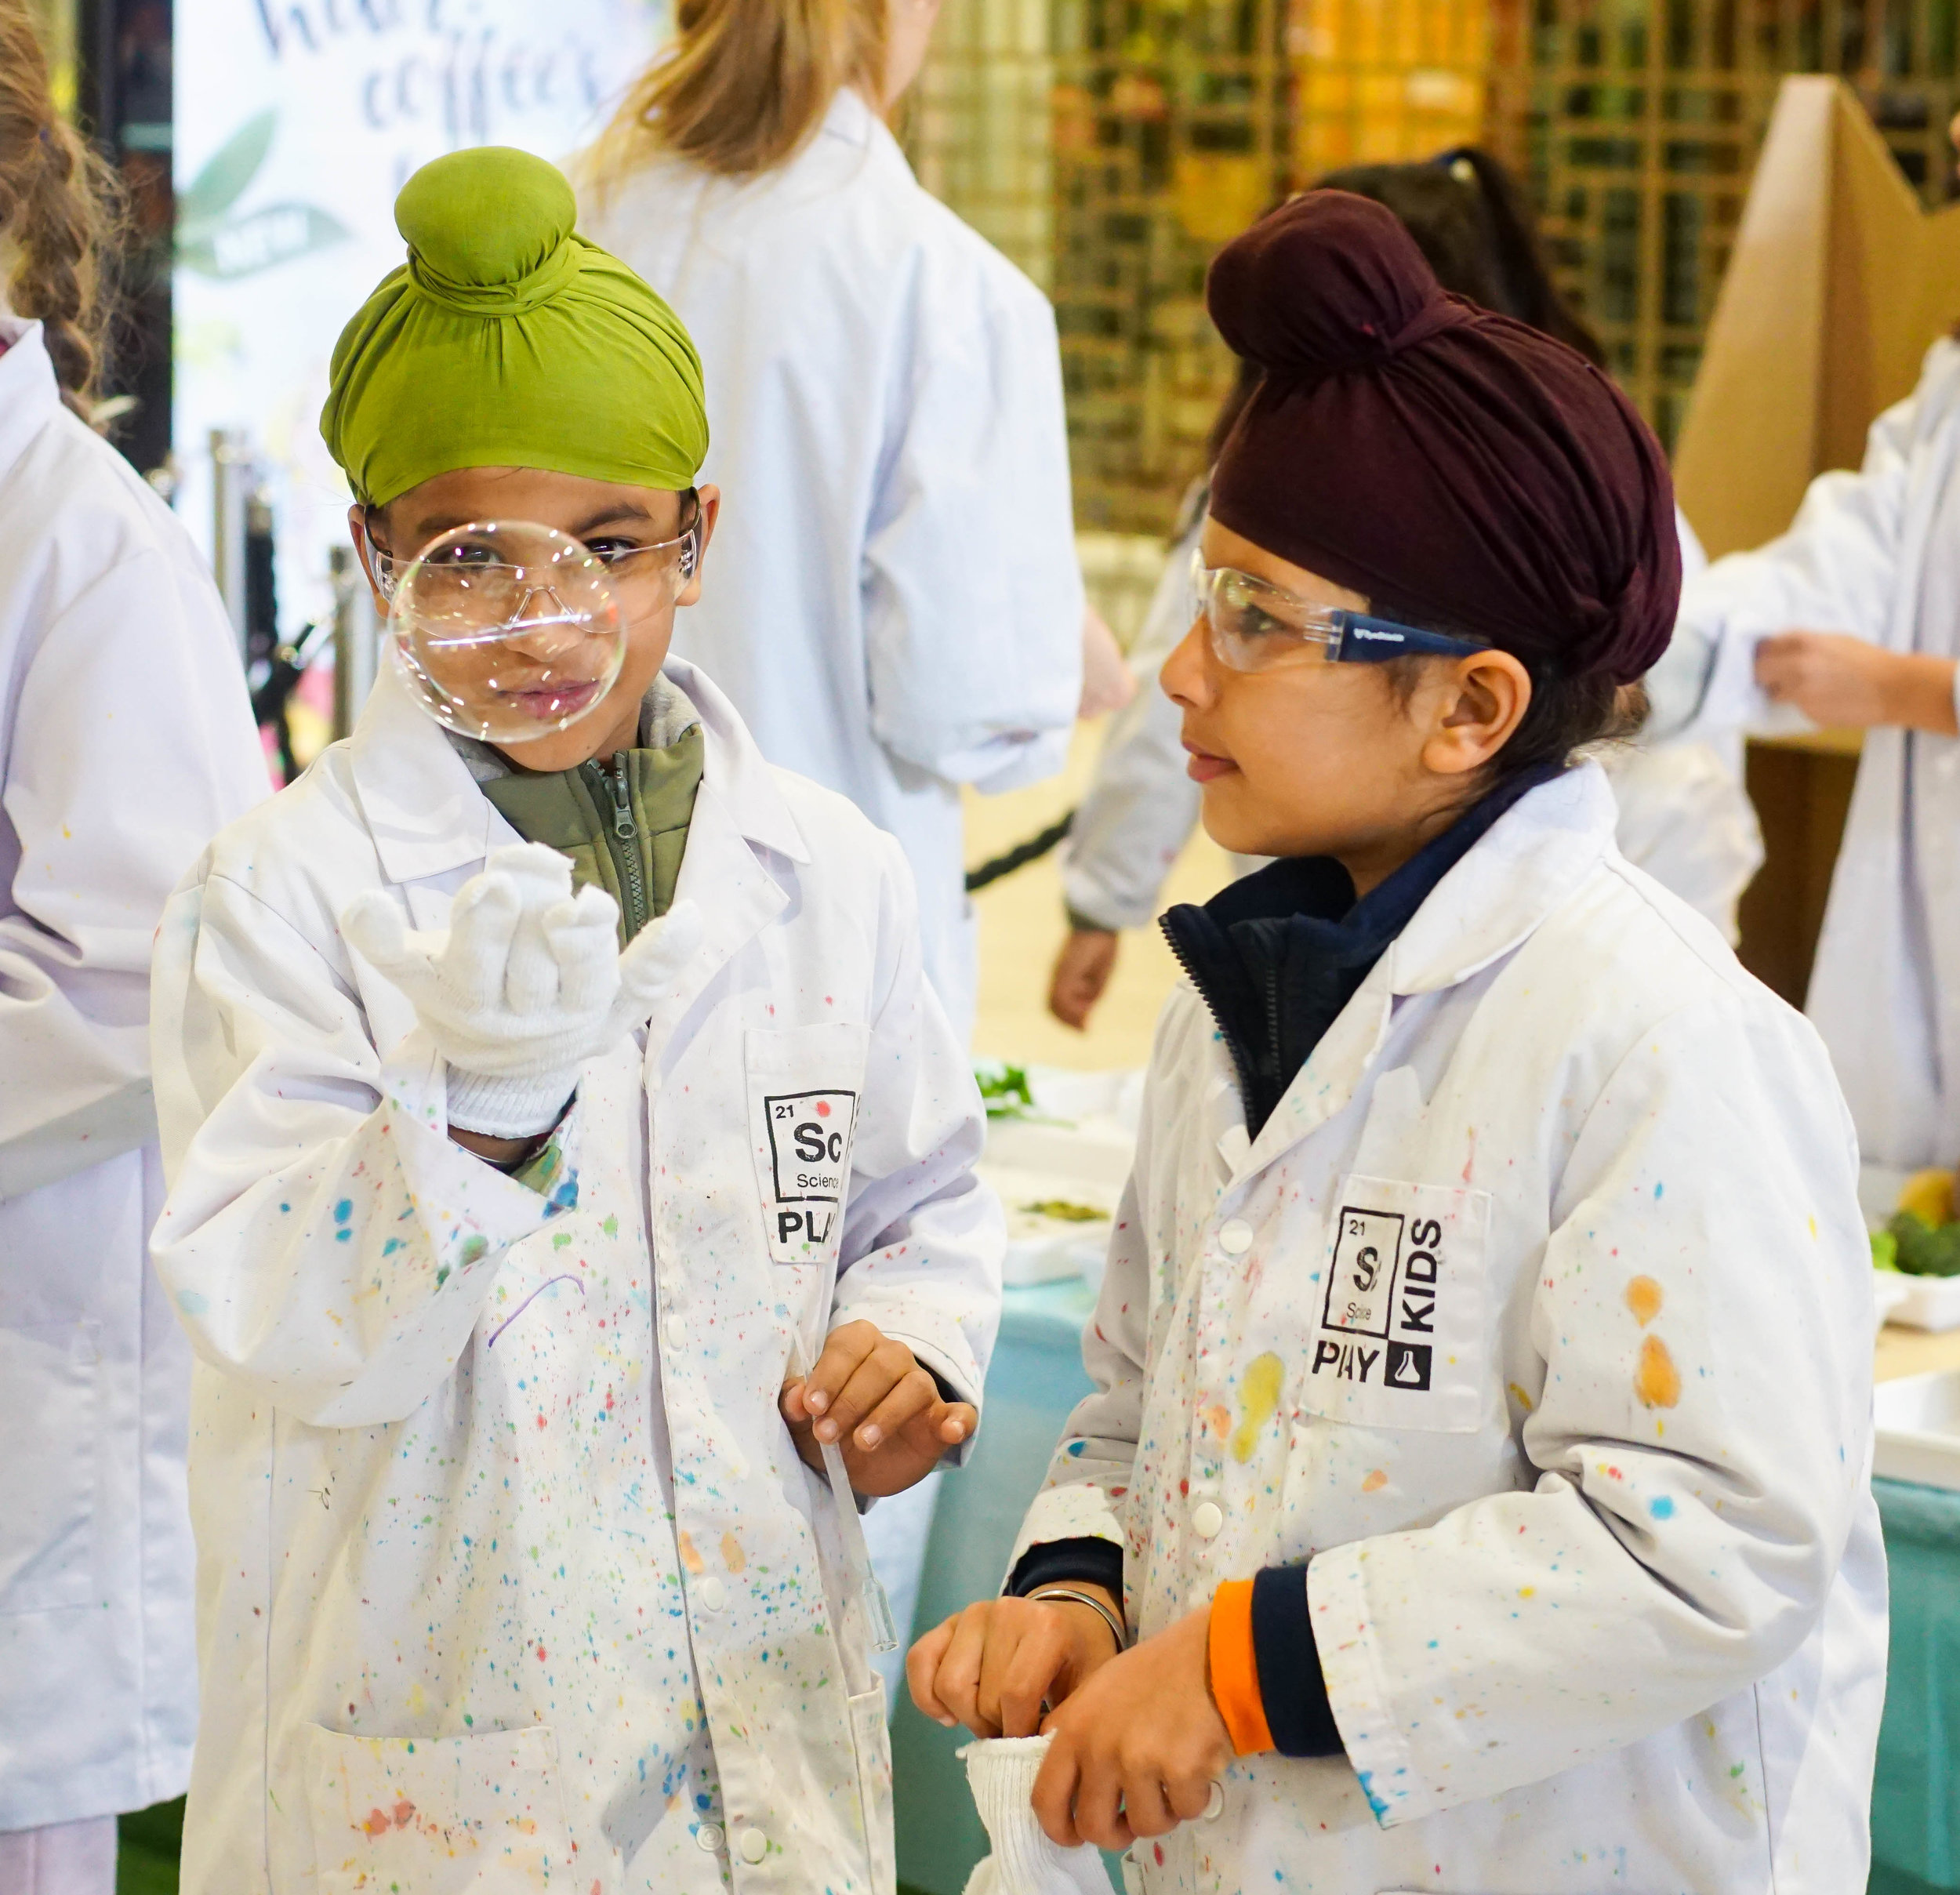 SciencePlay Kids - Little Life Lab Woodgrove Melton - 1 (4)-1.jpg